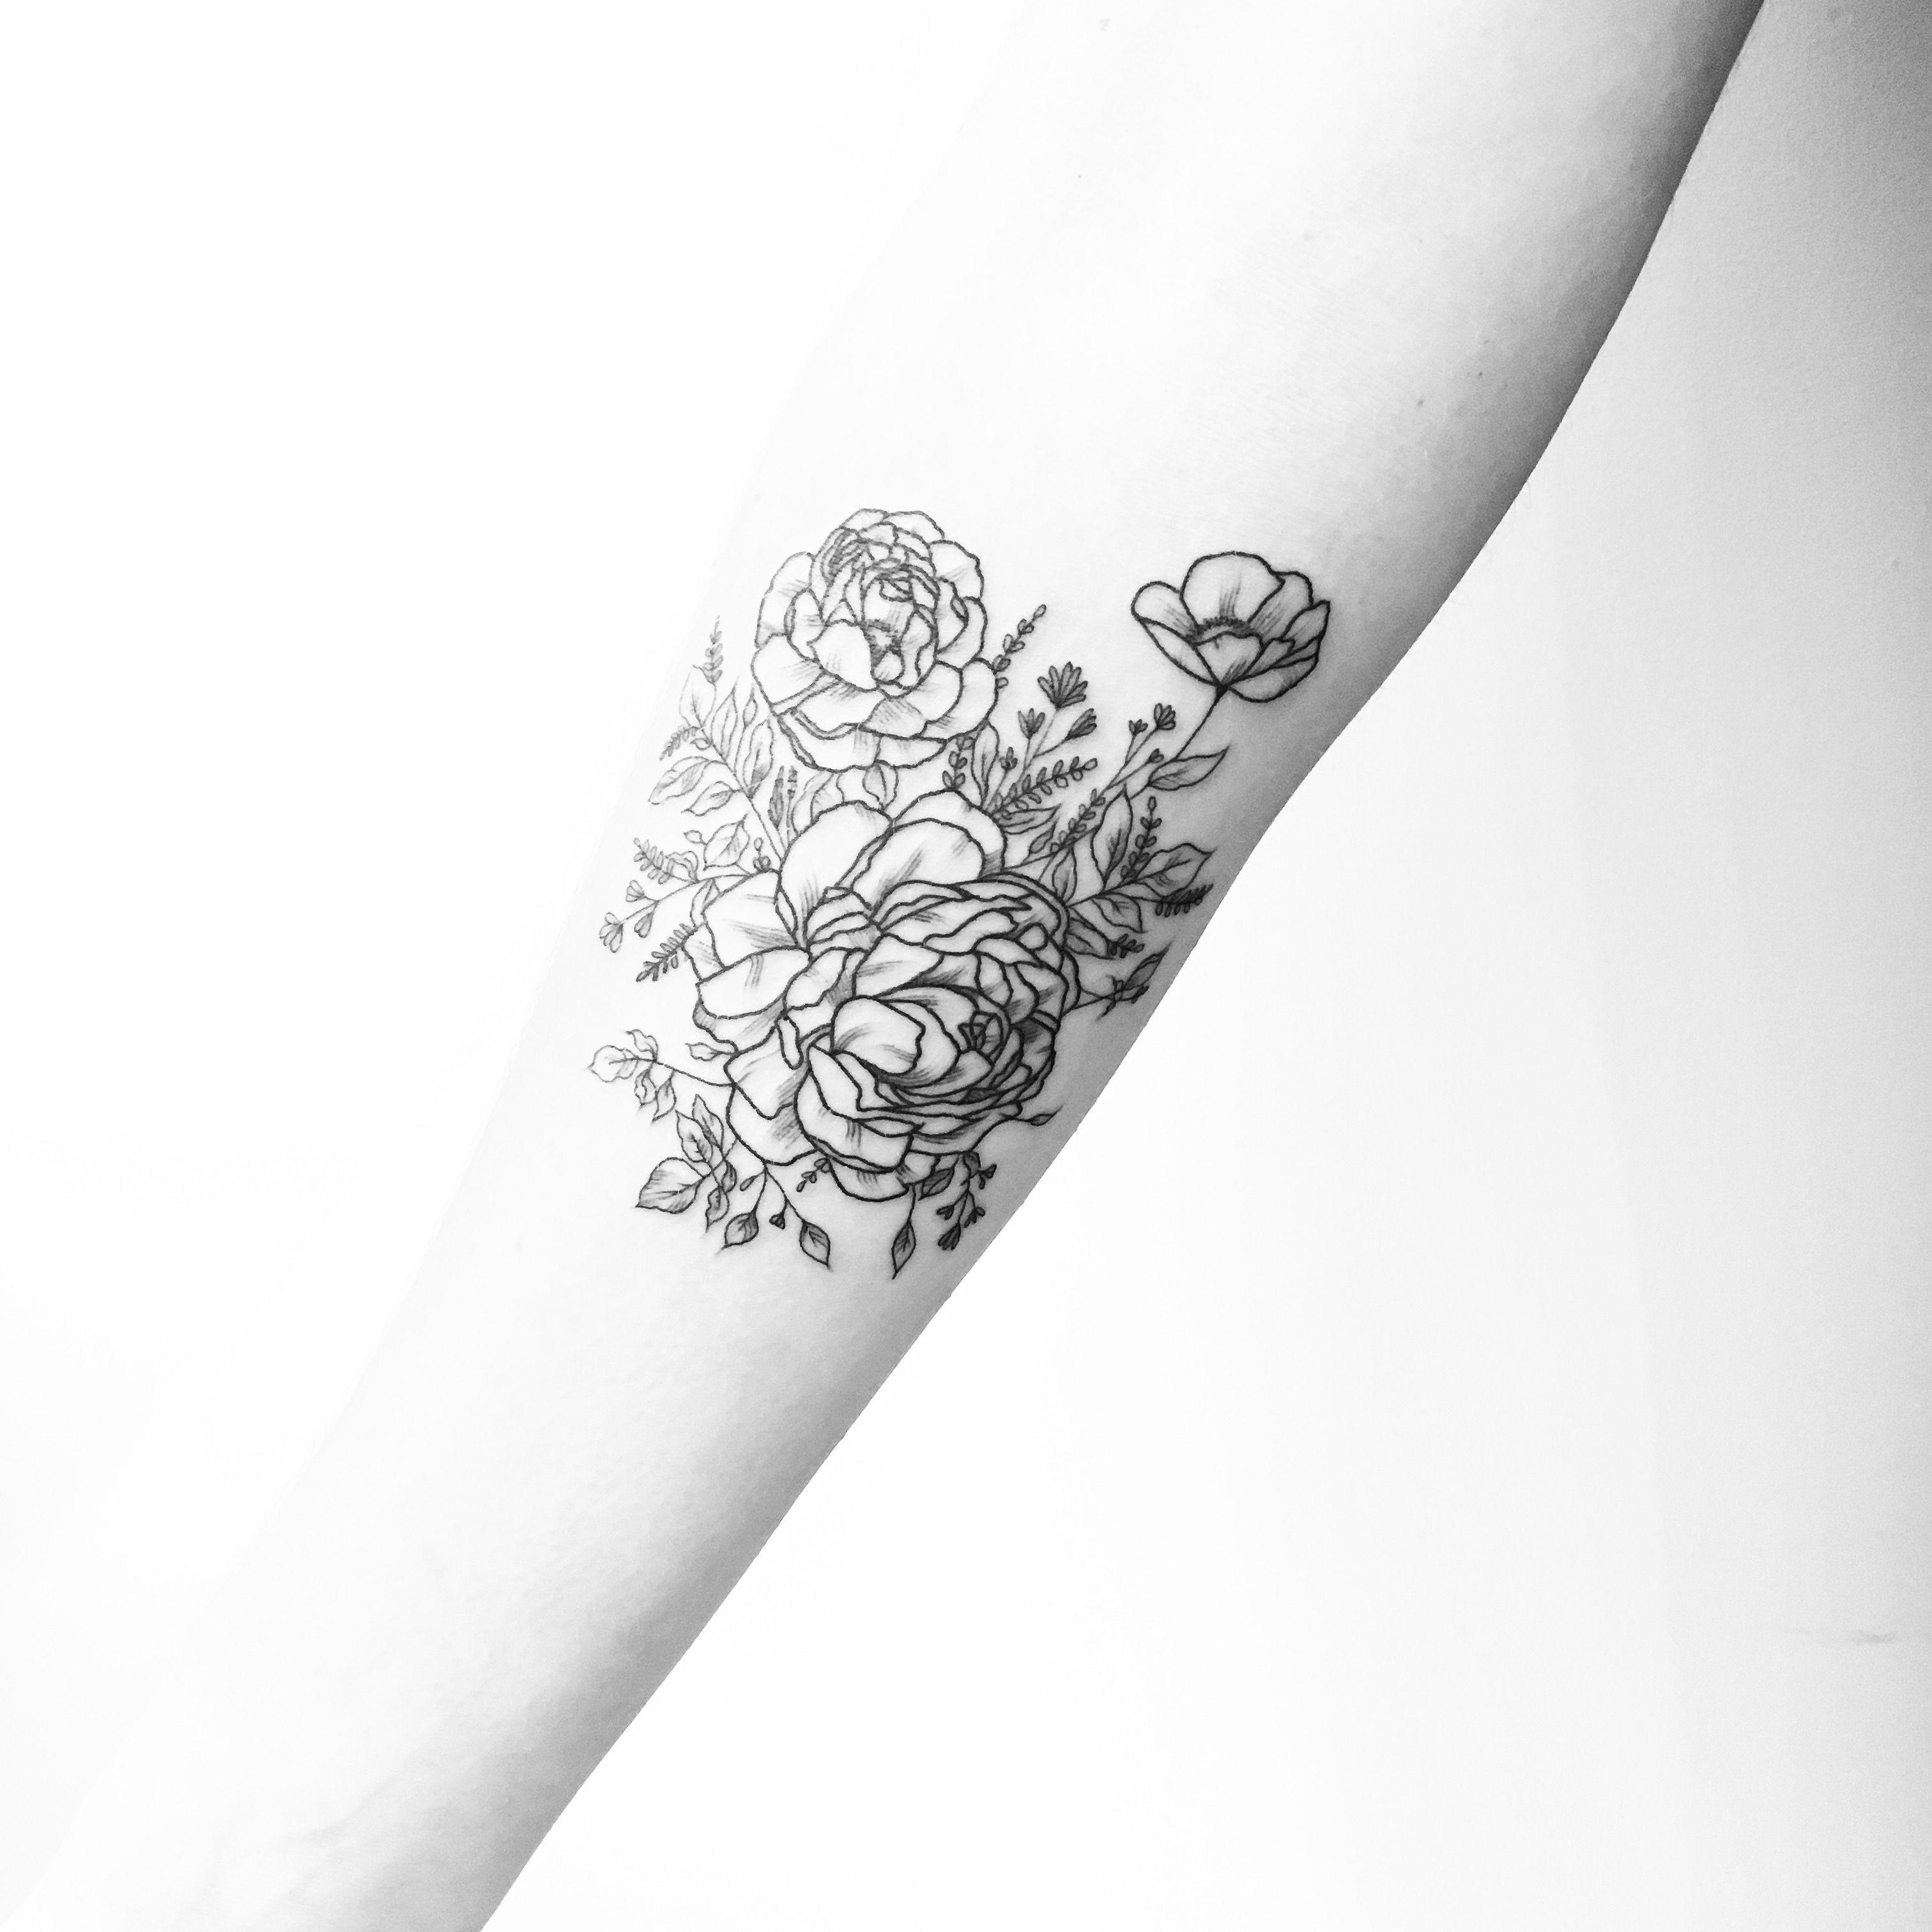 #carinsilver🌹at @lesmauxbleus #firsttattoo #tattoo #fineline #fineliner #fineliner #tats #tattooparis #paris #ink #inked #instaink #inkedlife #instagram #bw #blackwork #blackworkers #blackandwhite #blackworktattoo #instatattoo #instainked #tatouee #tatouage #flowertattoo #lemarais #flowers #fleurs #triangletattoo #dotstattoo